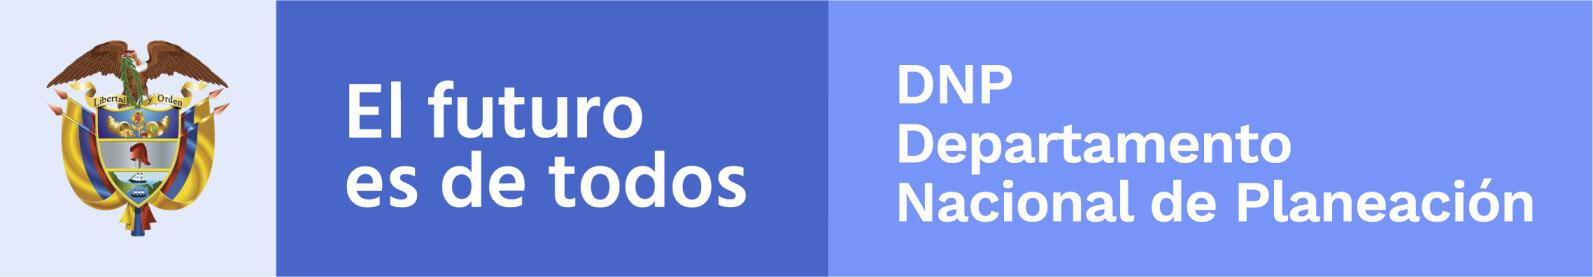 dnp-logo